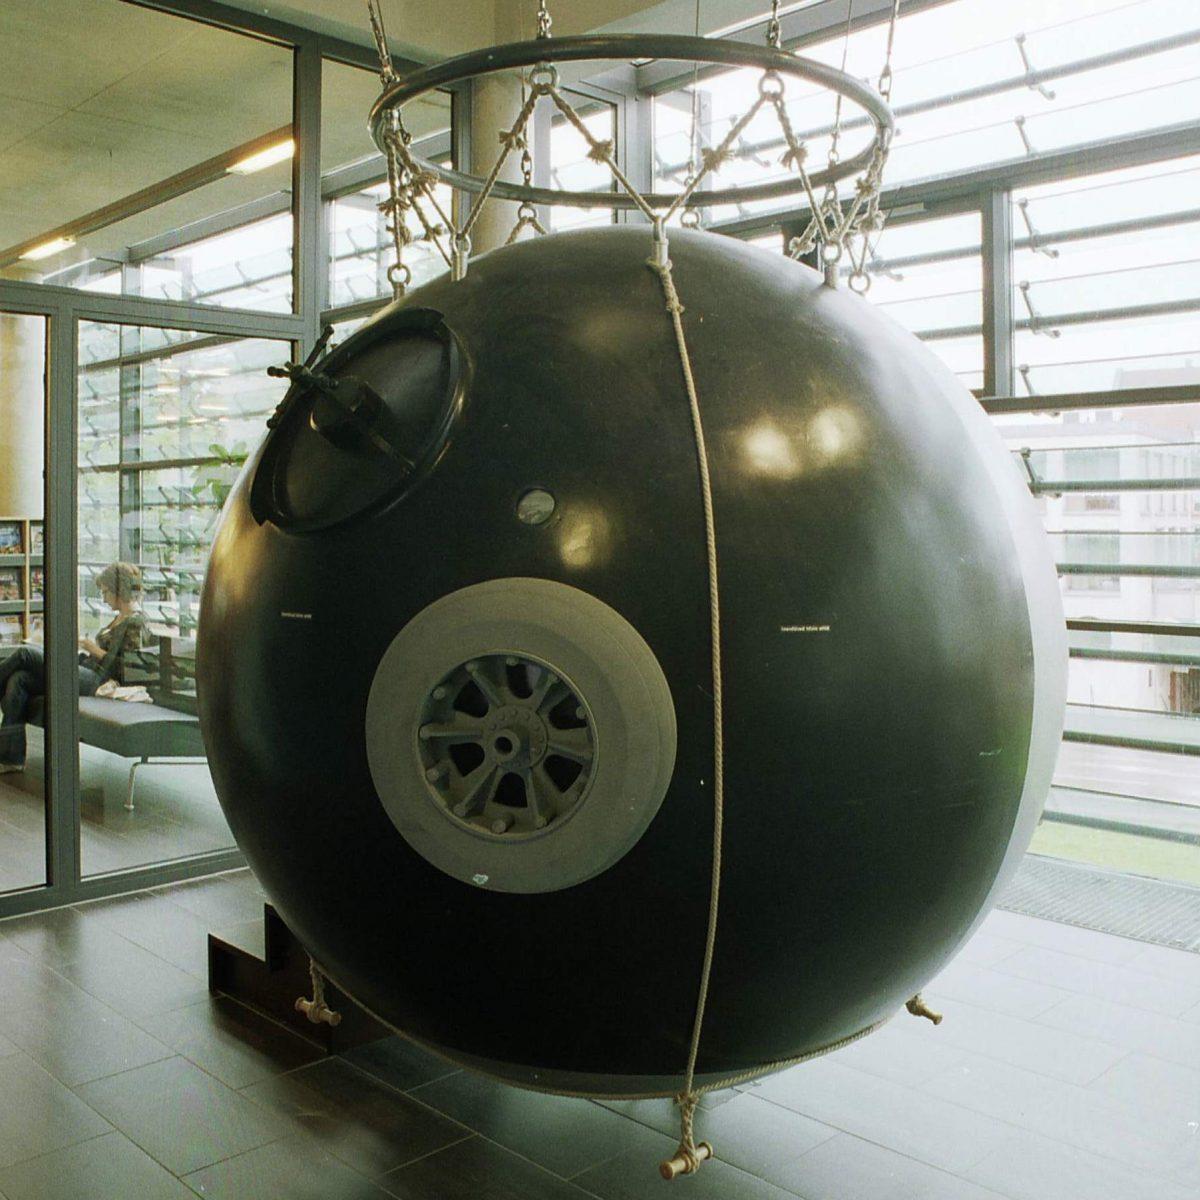 Piccard-Gondel Ballonmuseum Gersthofen